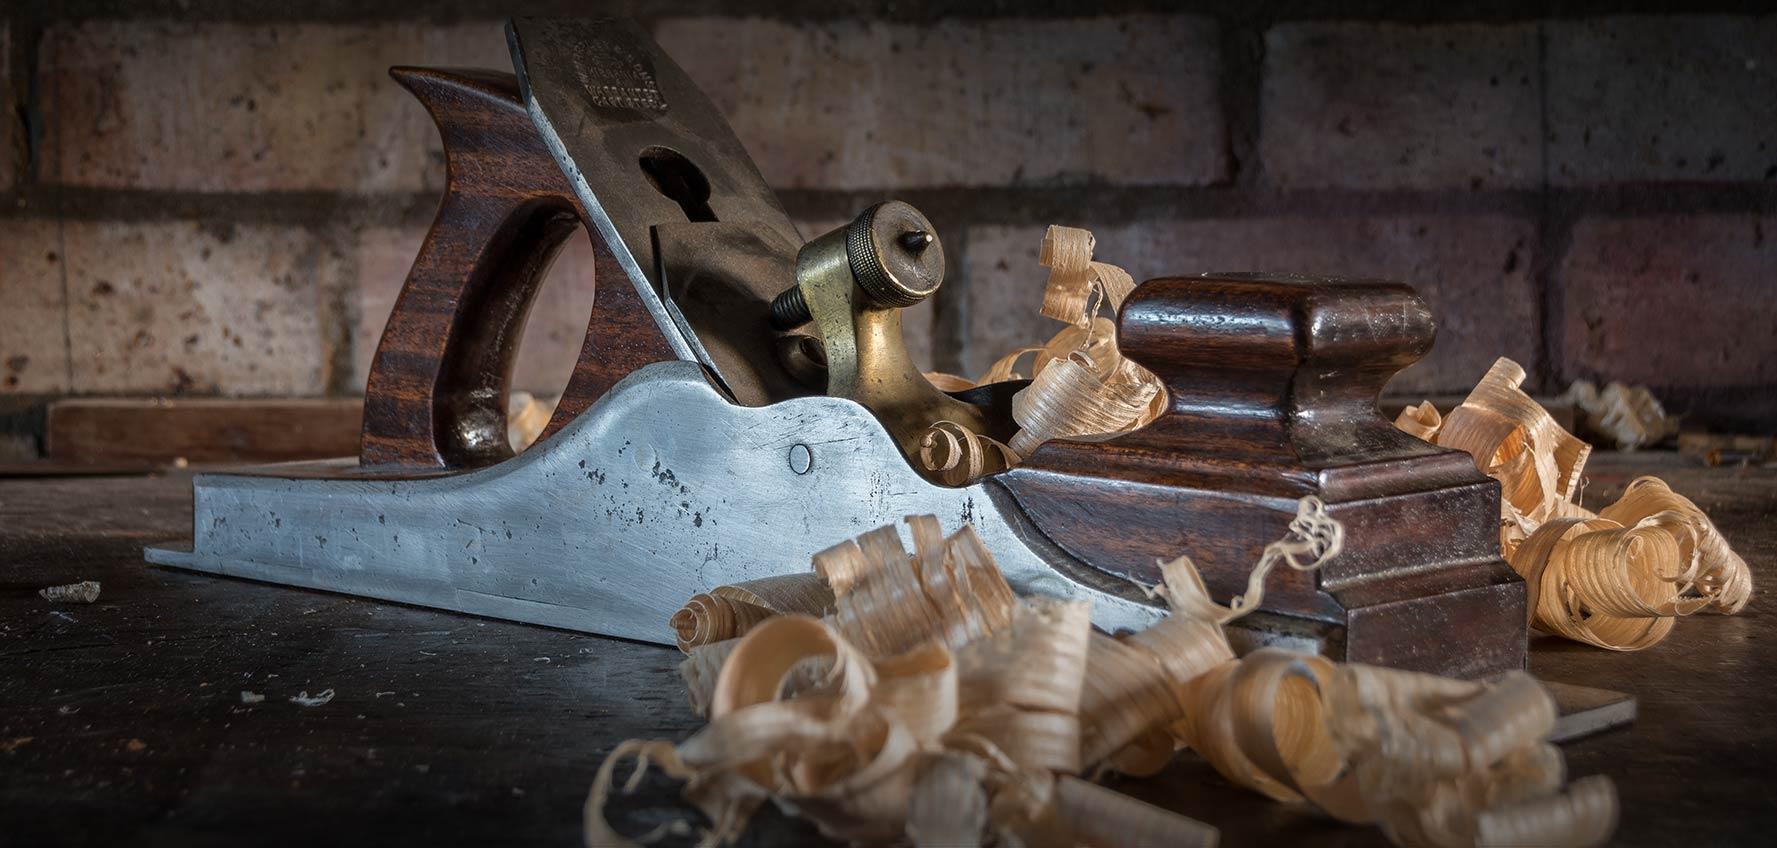 HC Restorations Restorers Of Antiques & Modern Furniture. French Polishing